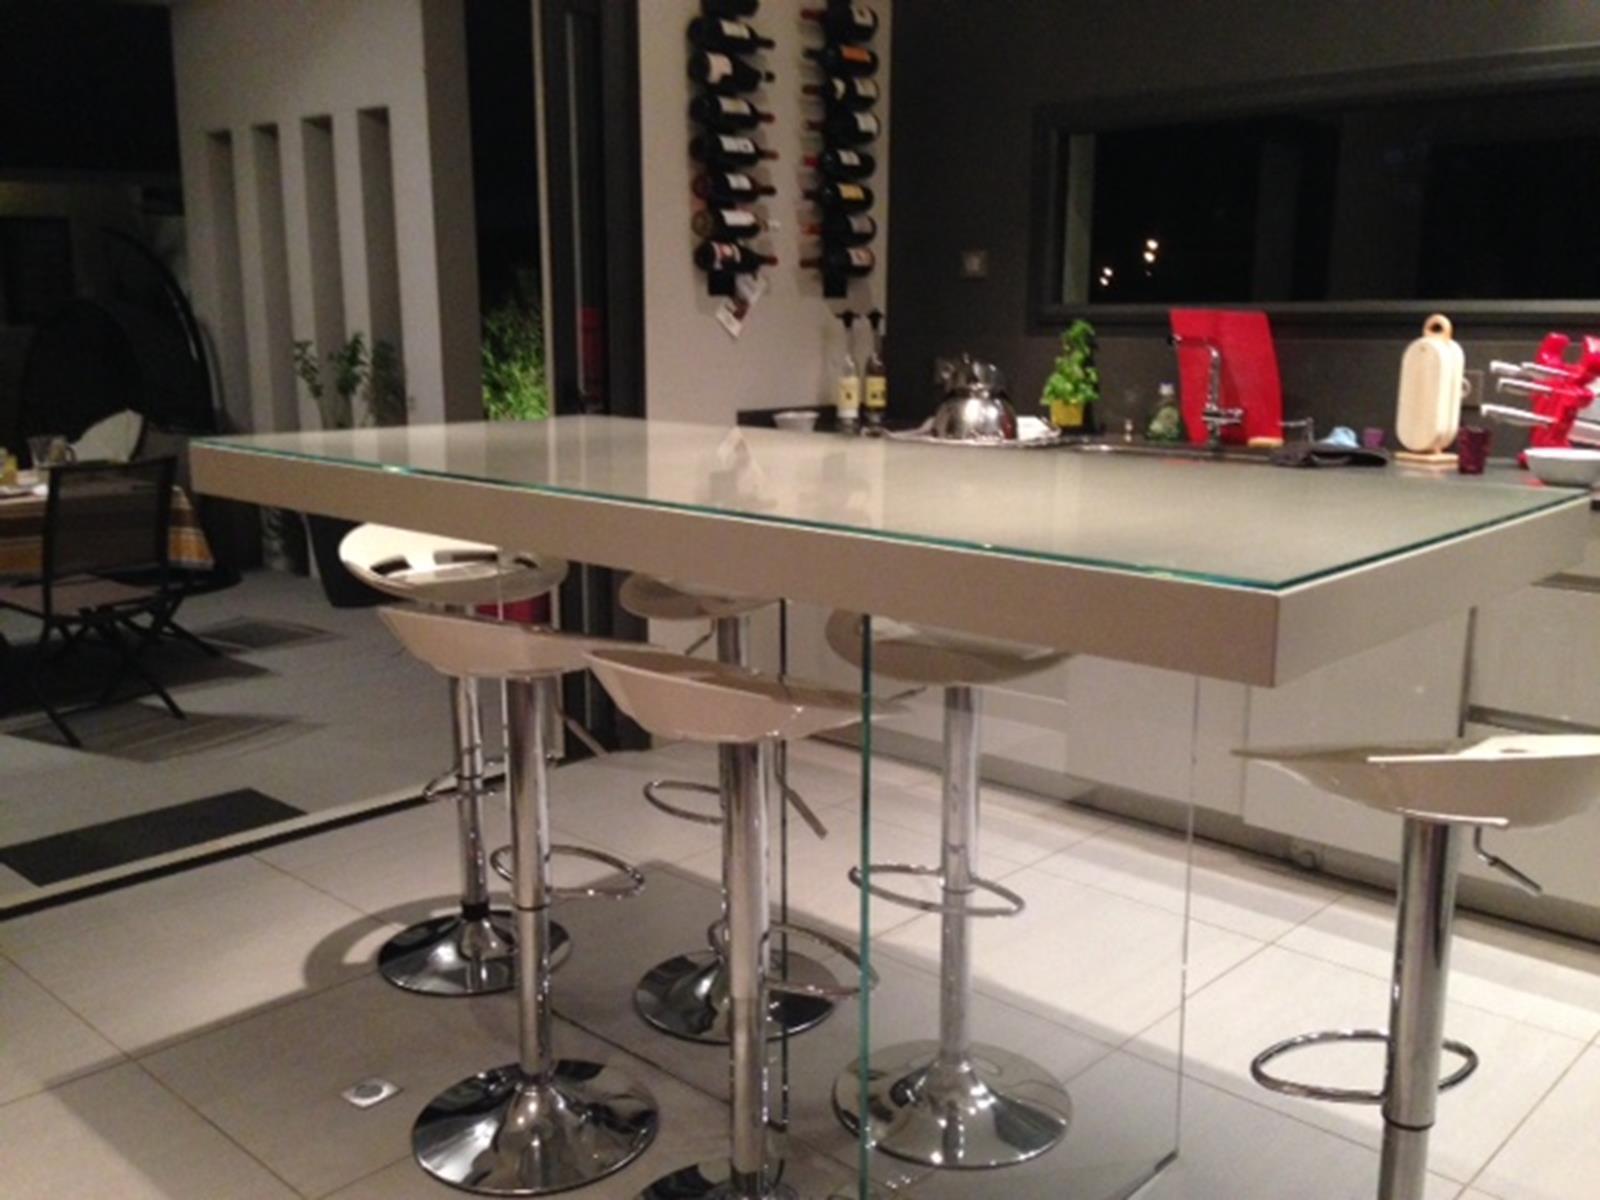 Verre fourniture de verre extra clair s curit toulouse 31 for Extra cuisine toulouse